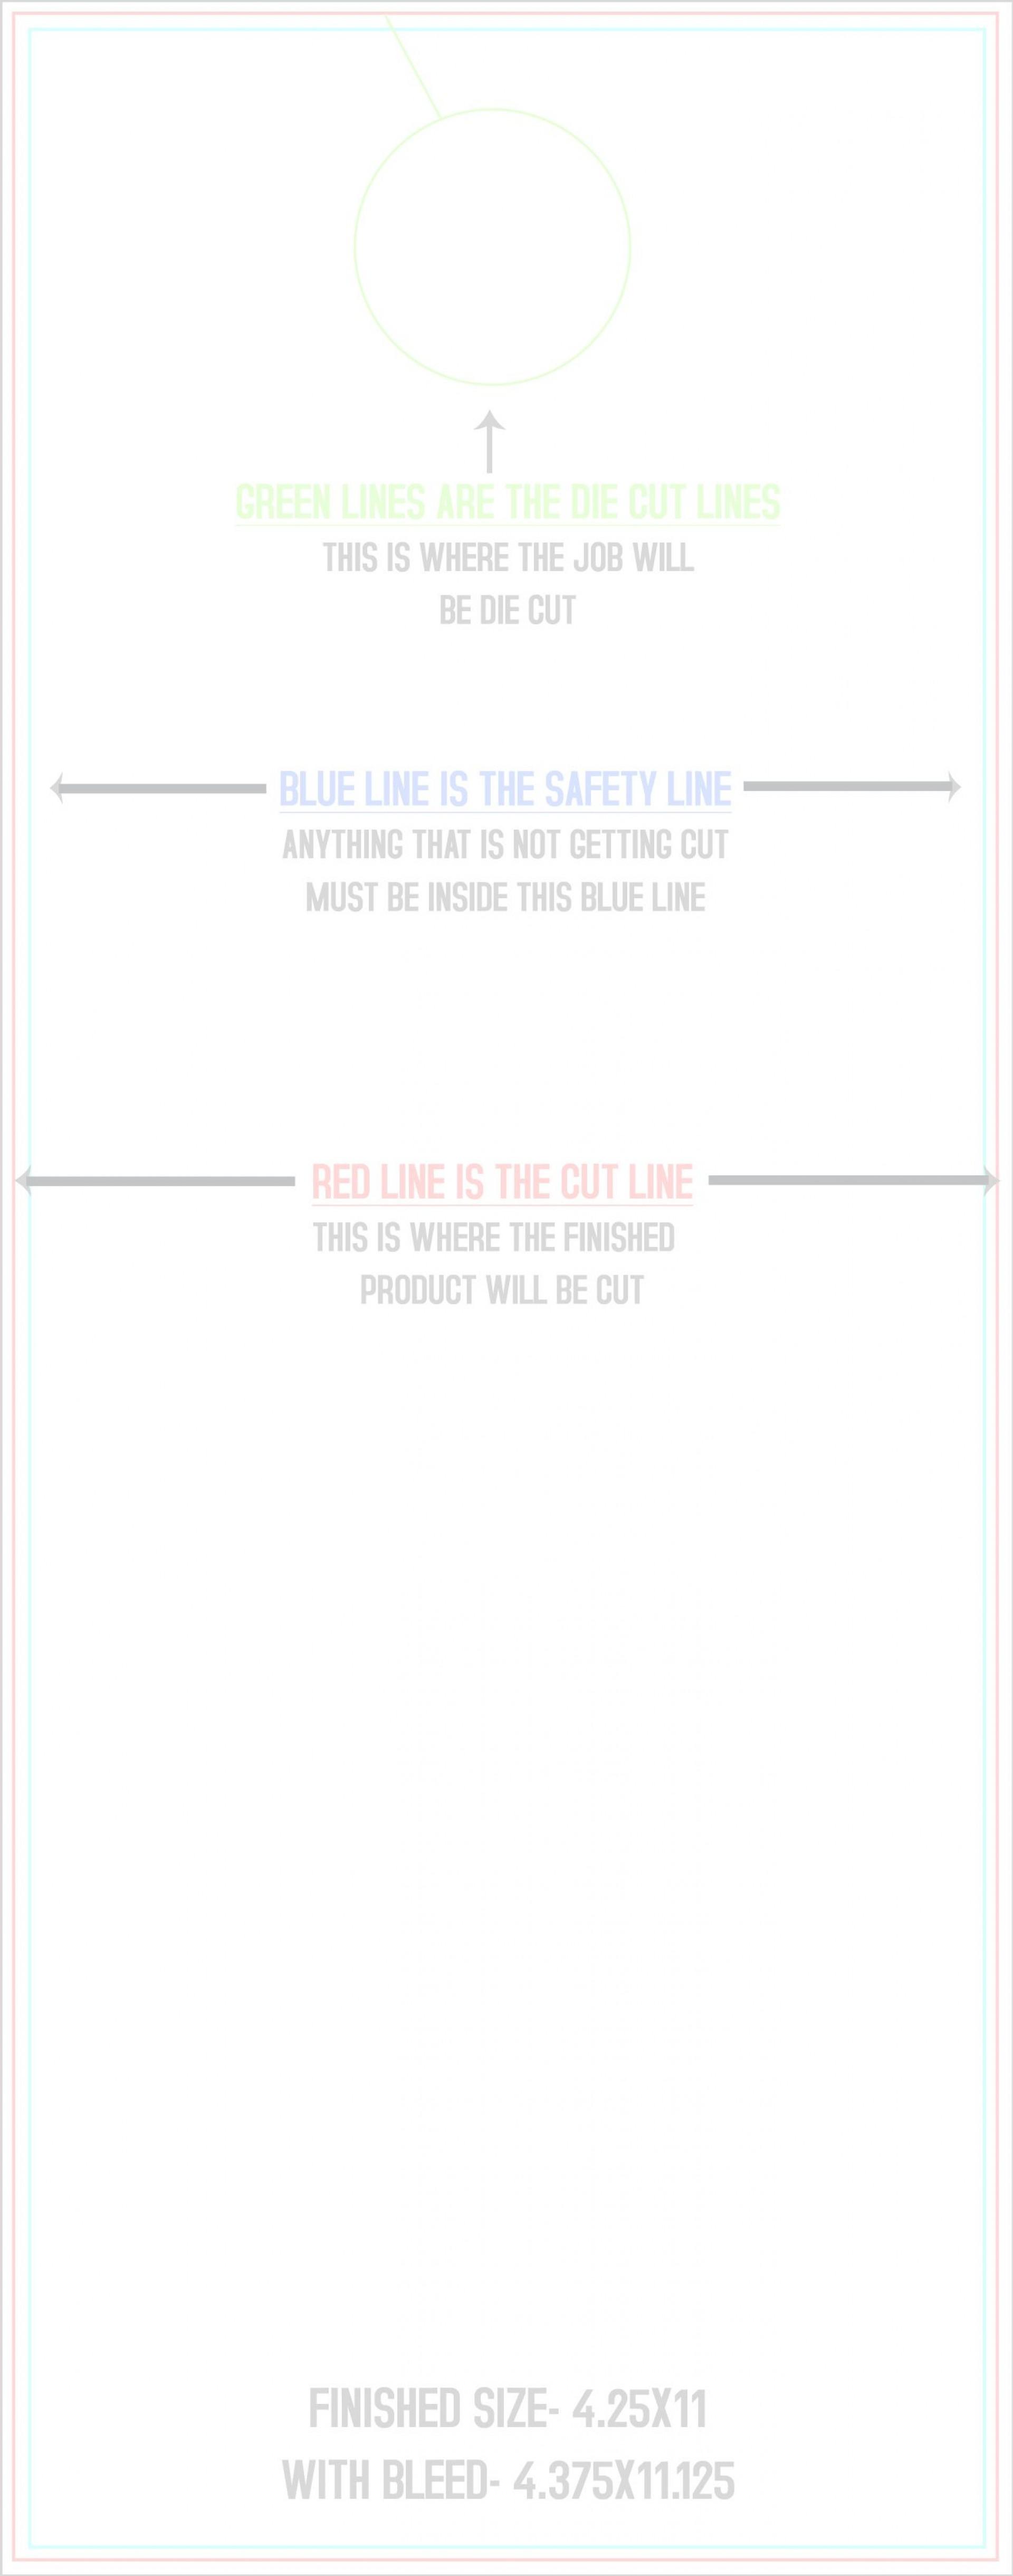 002 Stupendou Free Printable Door Hanger Template Photo  Templates Wedding Editable1920